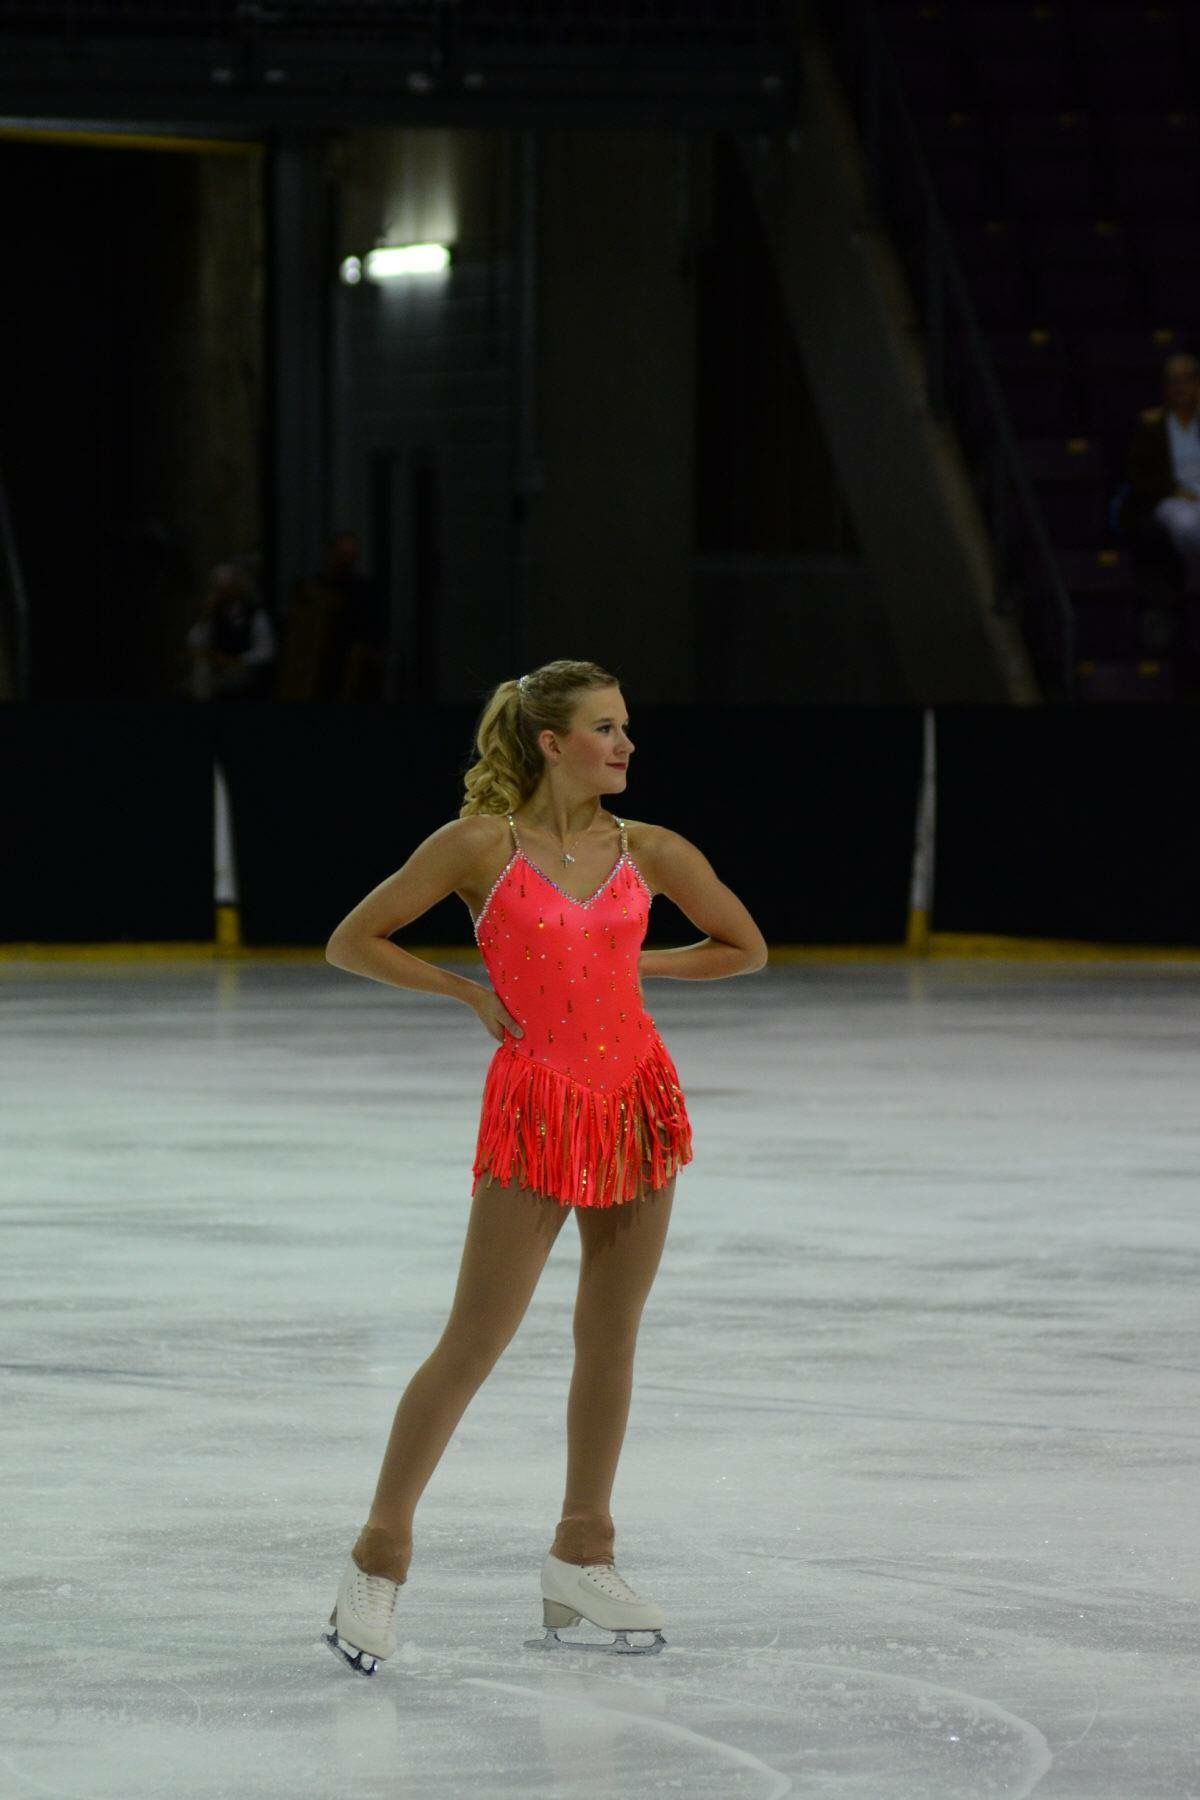 Figure skating dress for Smash! by Kelley Matthews Designs